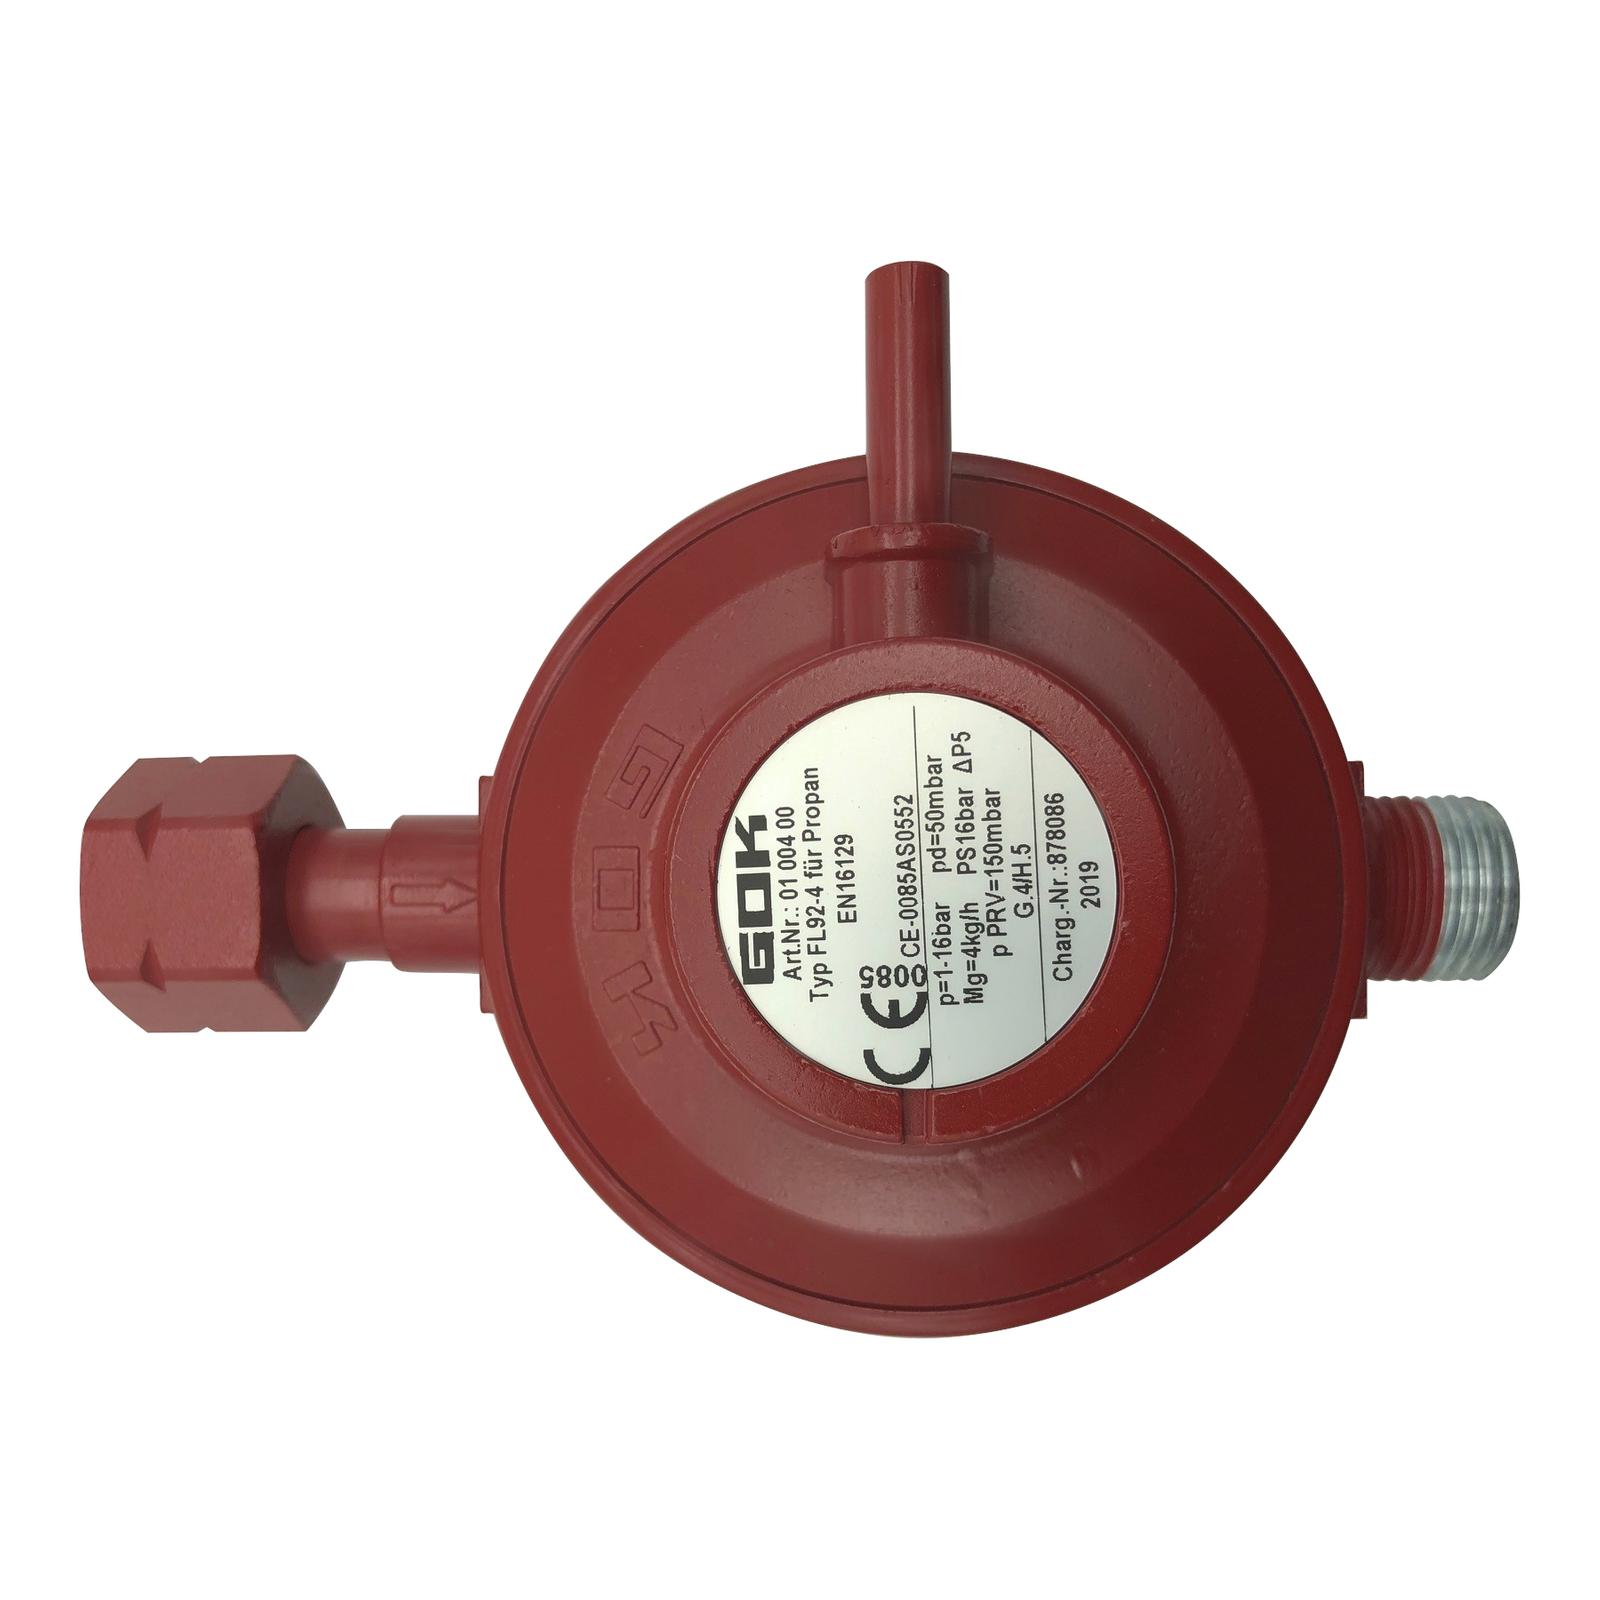 GOK 25-50 mbar verstellbar Gasregler Druckminderer Niederdruckregler 30 Gas